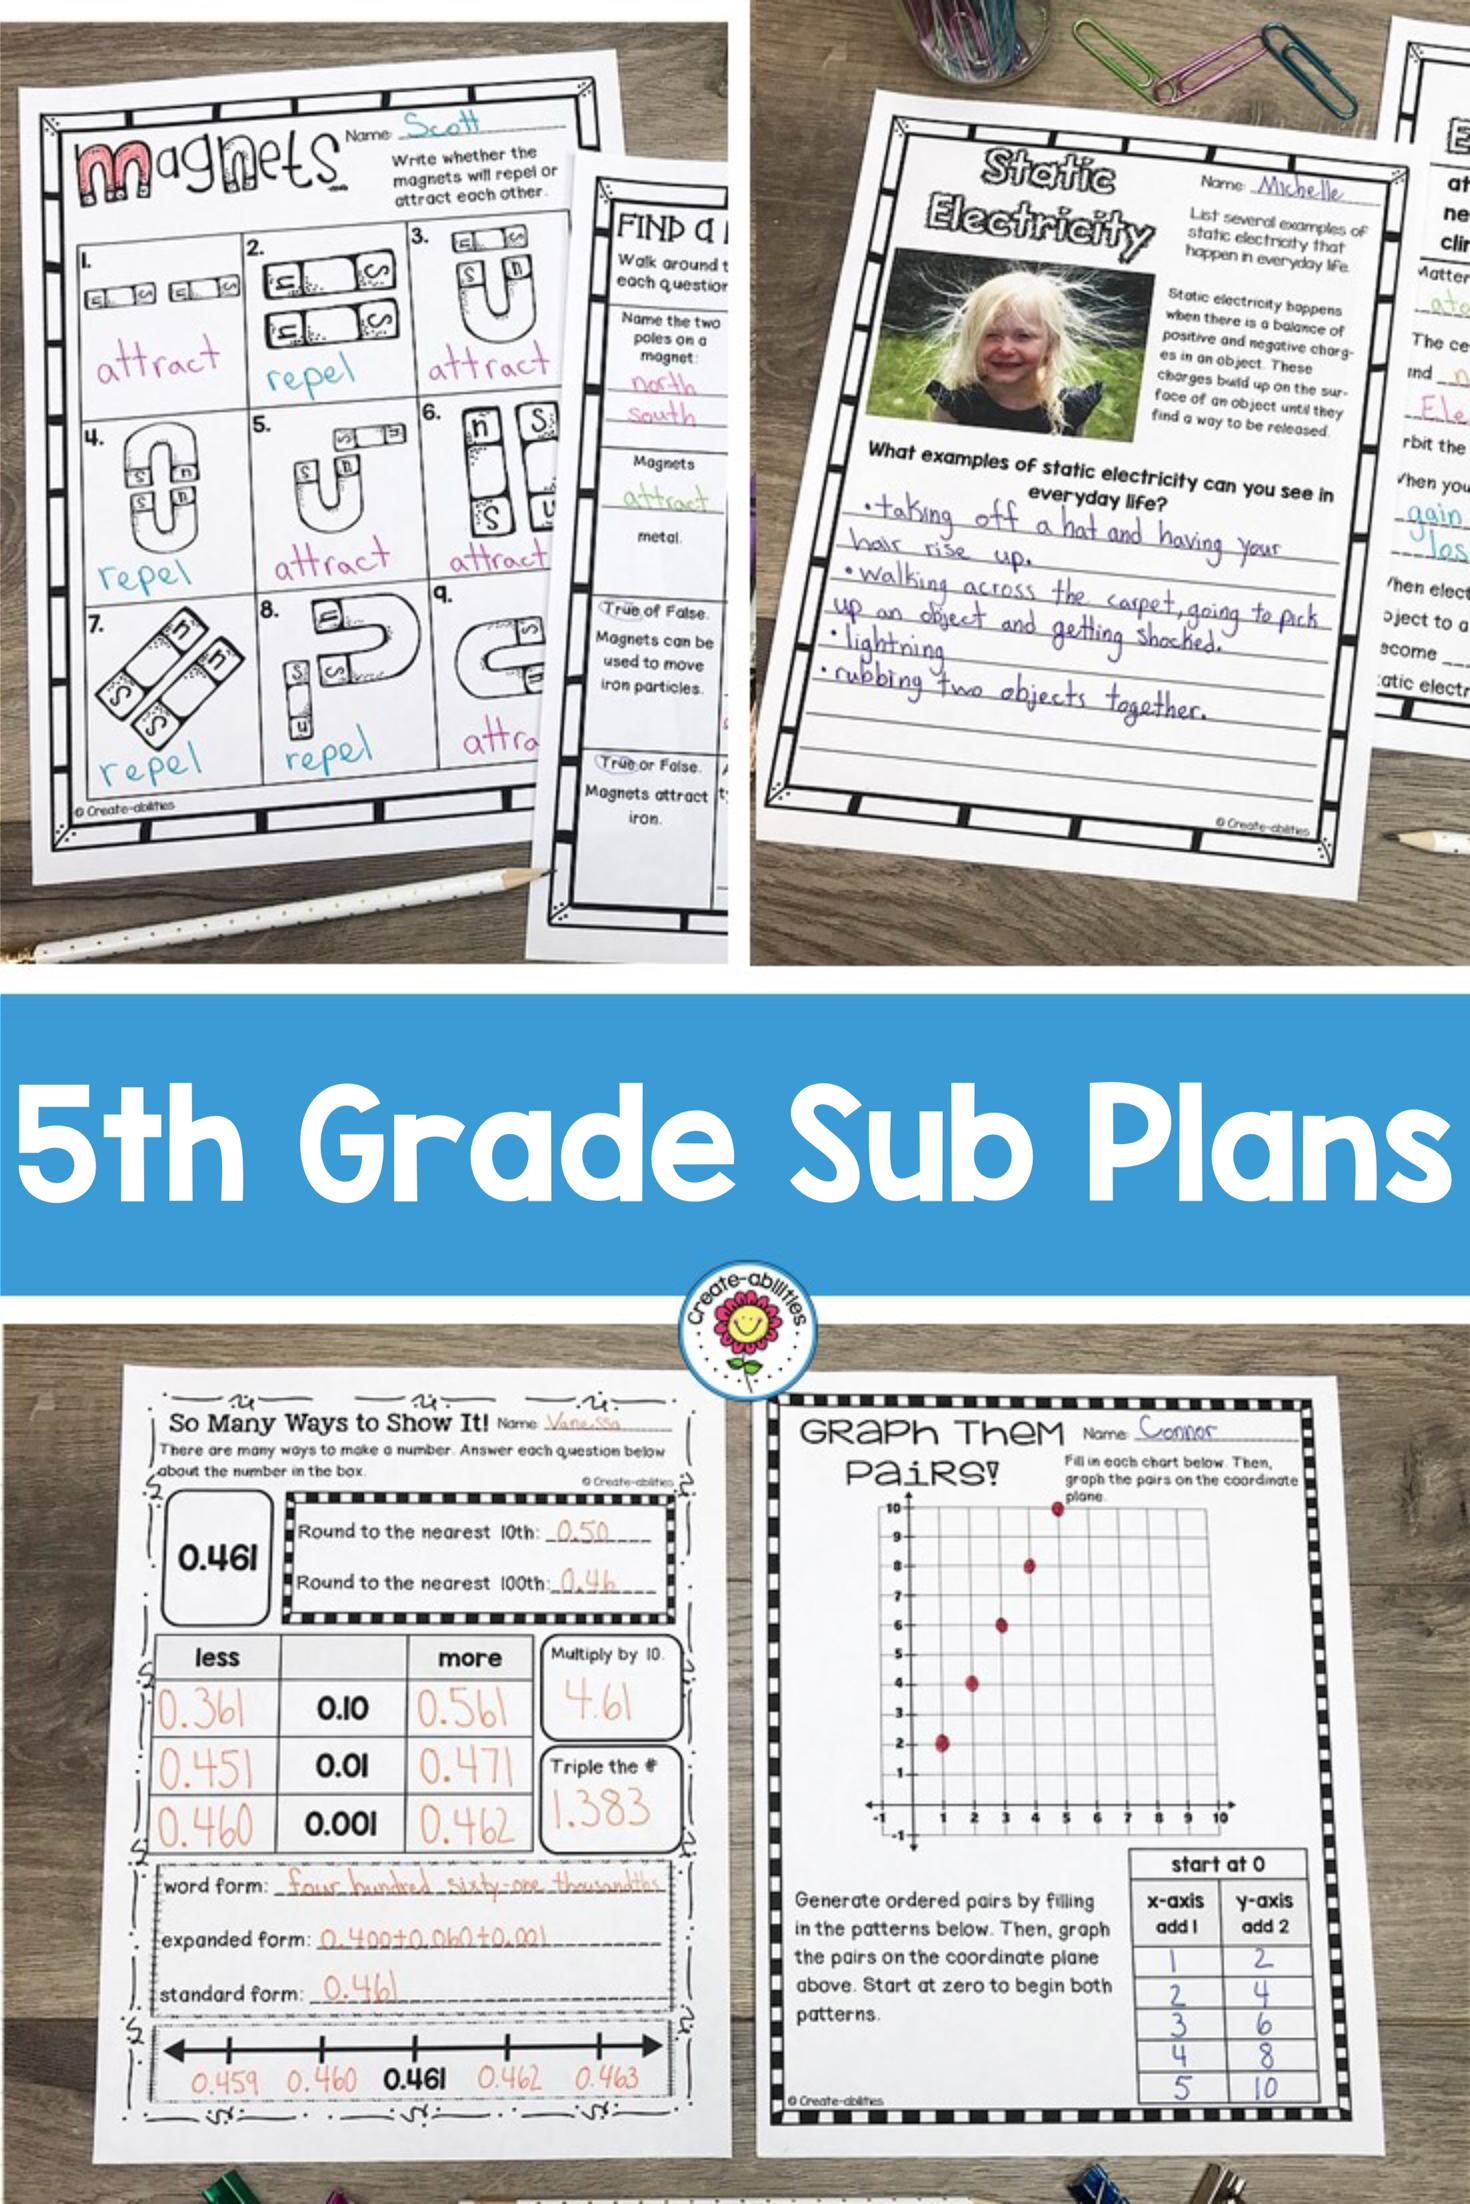 Sub Plans 5th Grade | Pinterest | Art activities, Substitute teacher ...